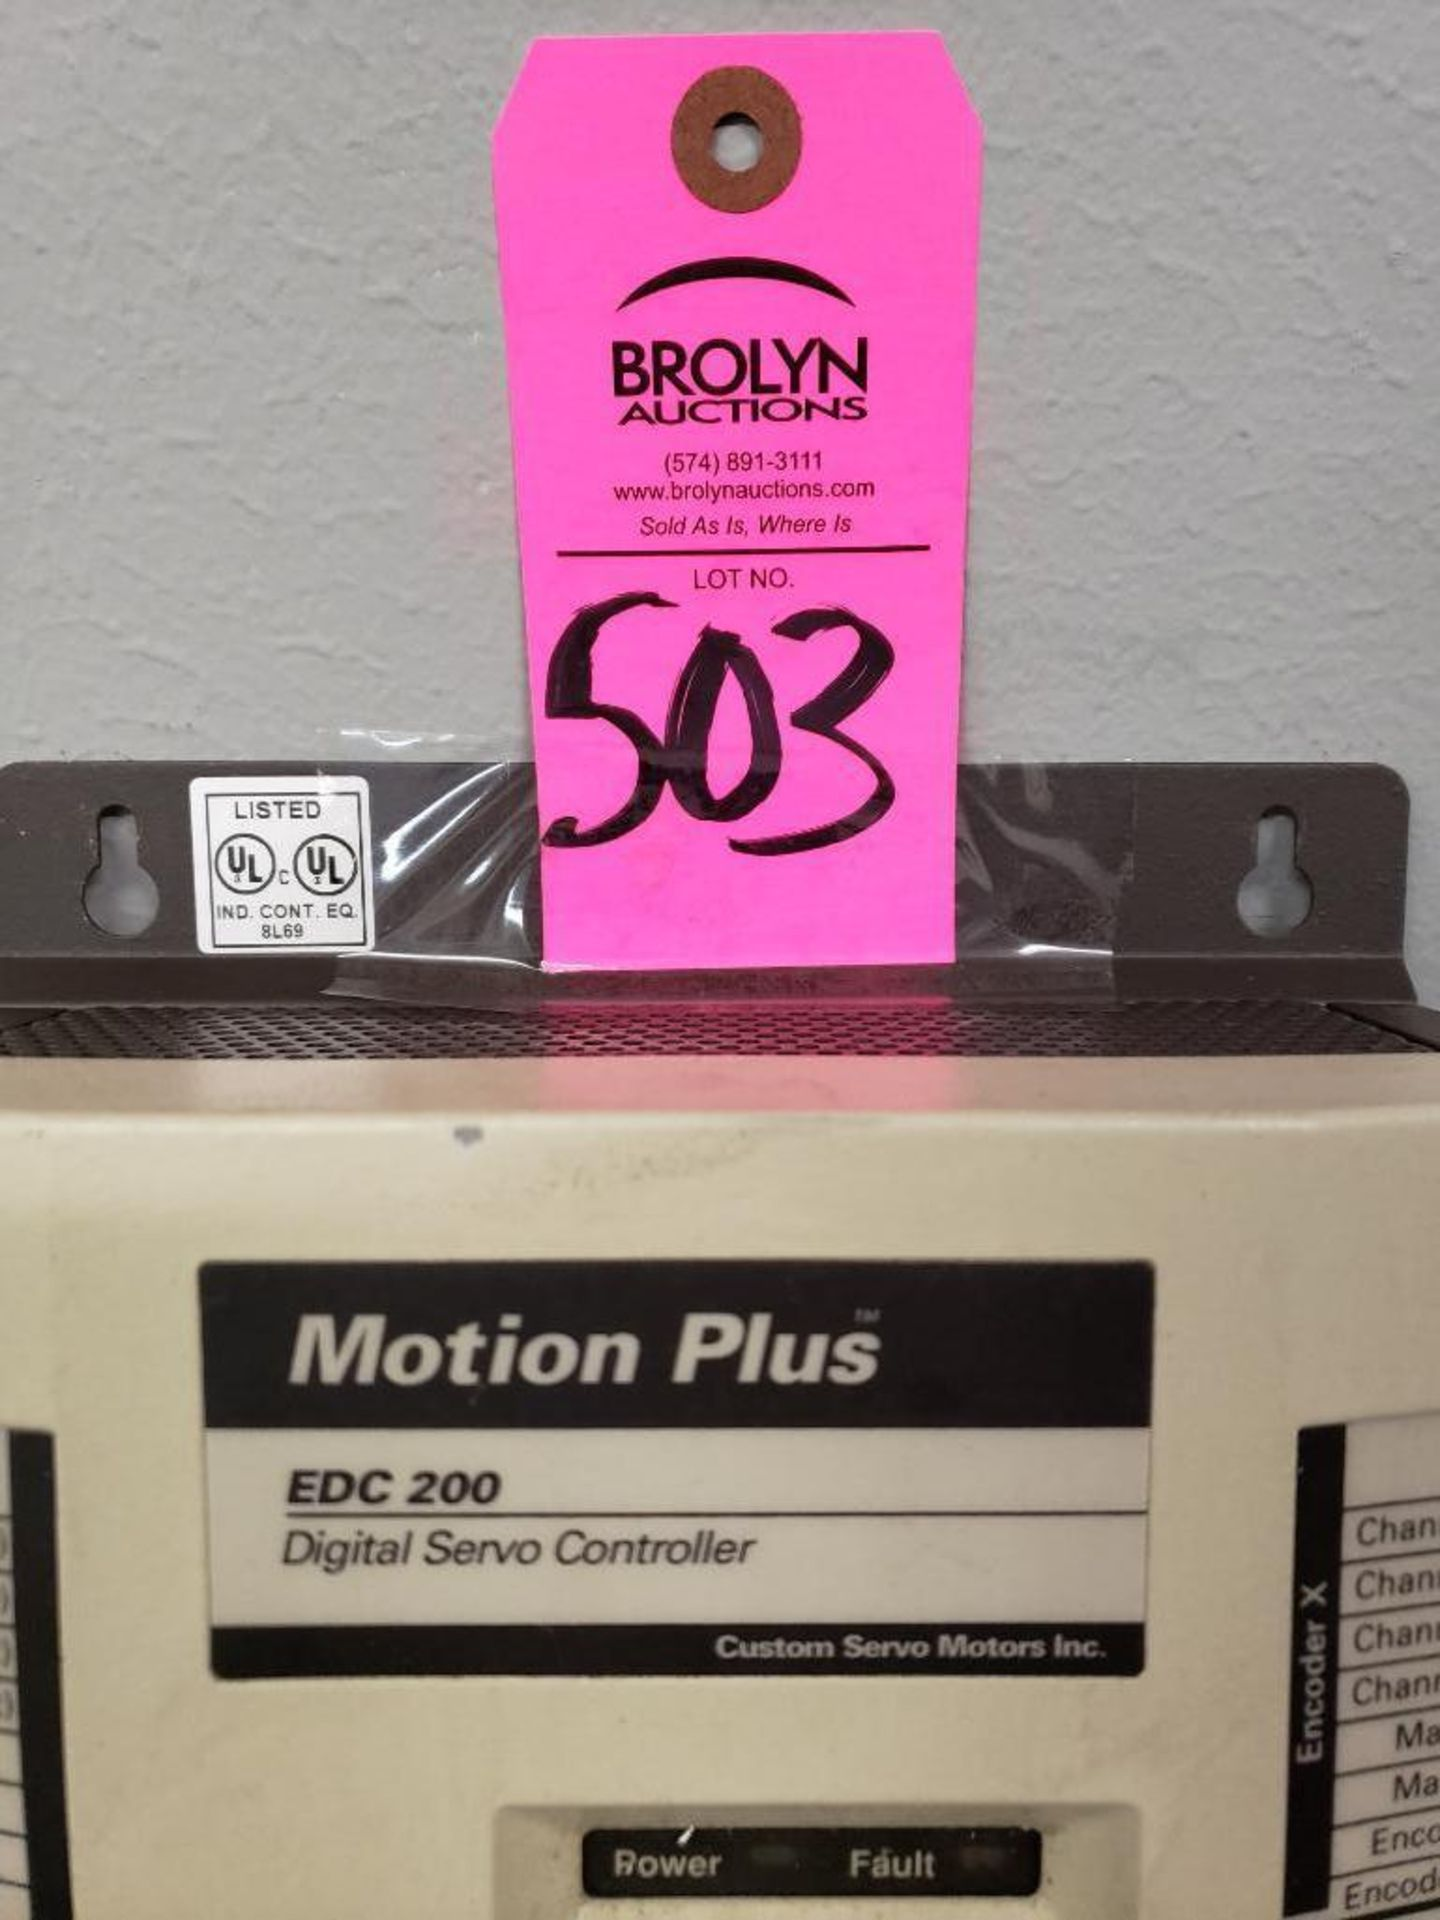 Lot 503 - Motion Plus model EDC3200 Digital Servo Controller.